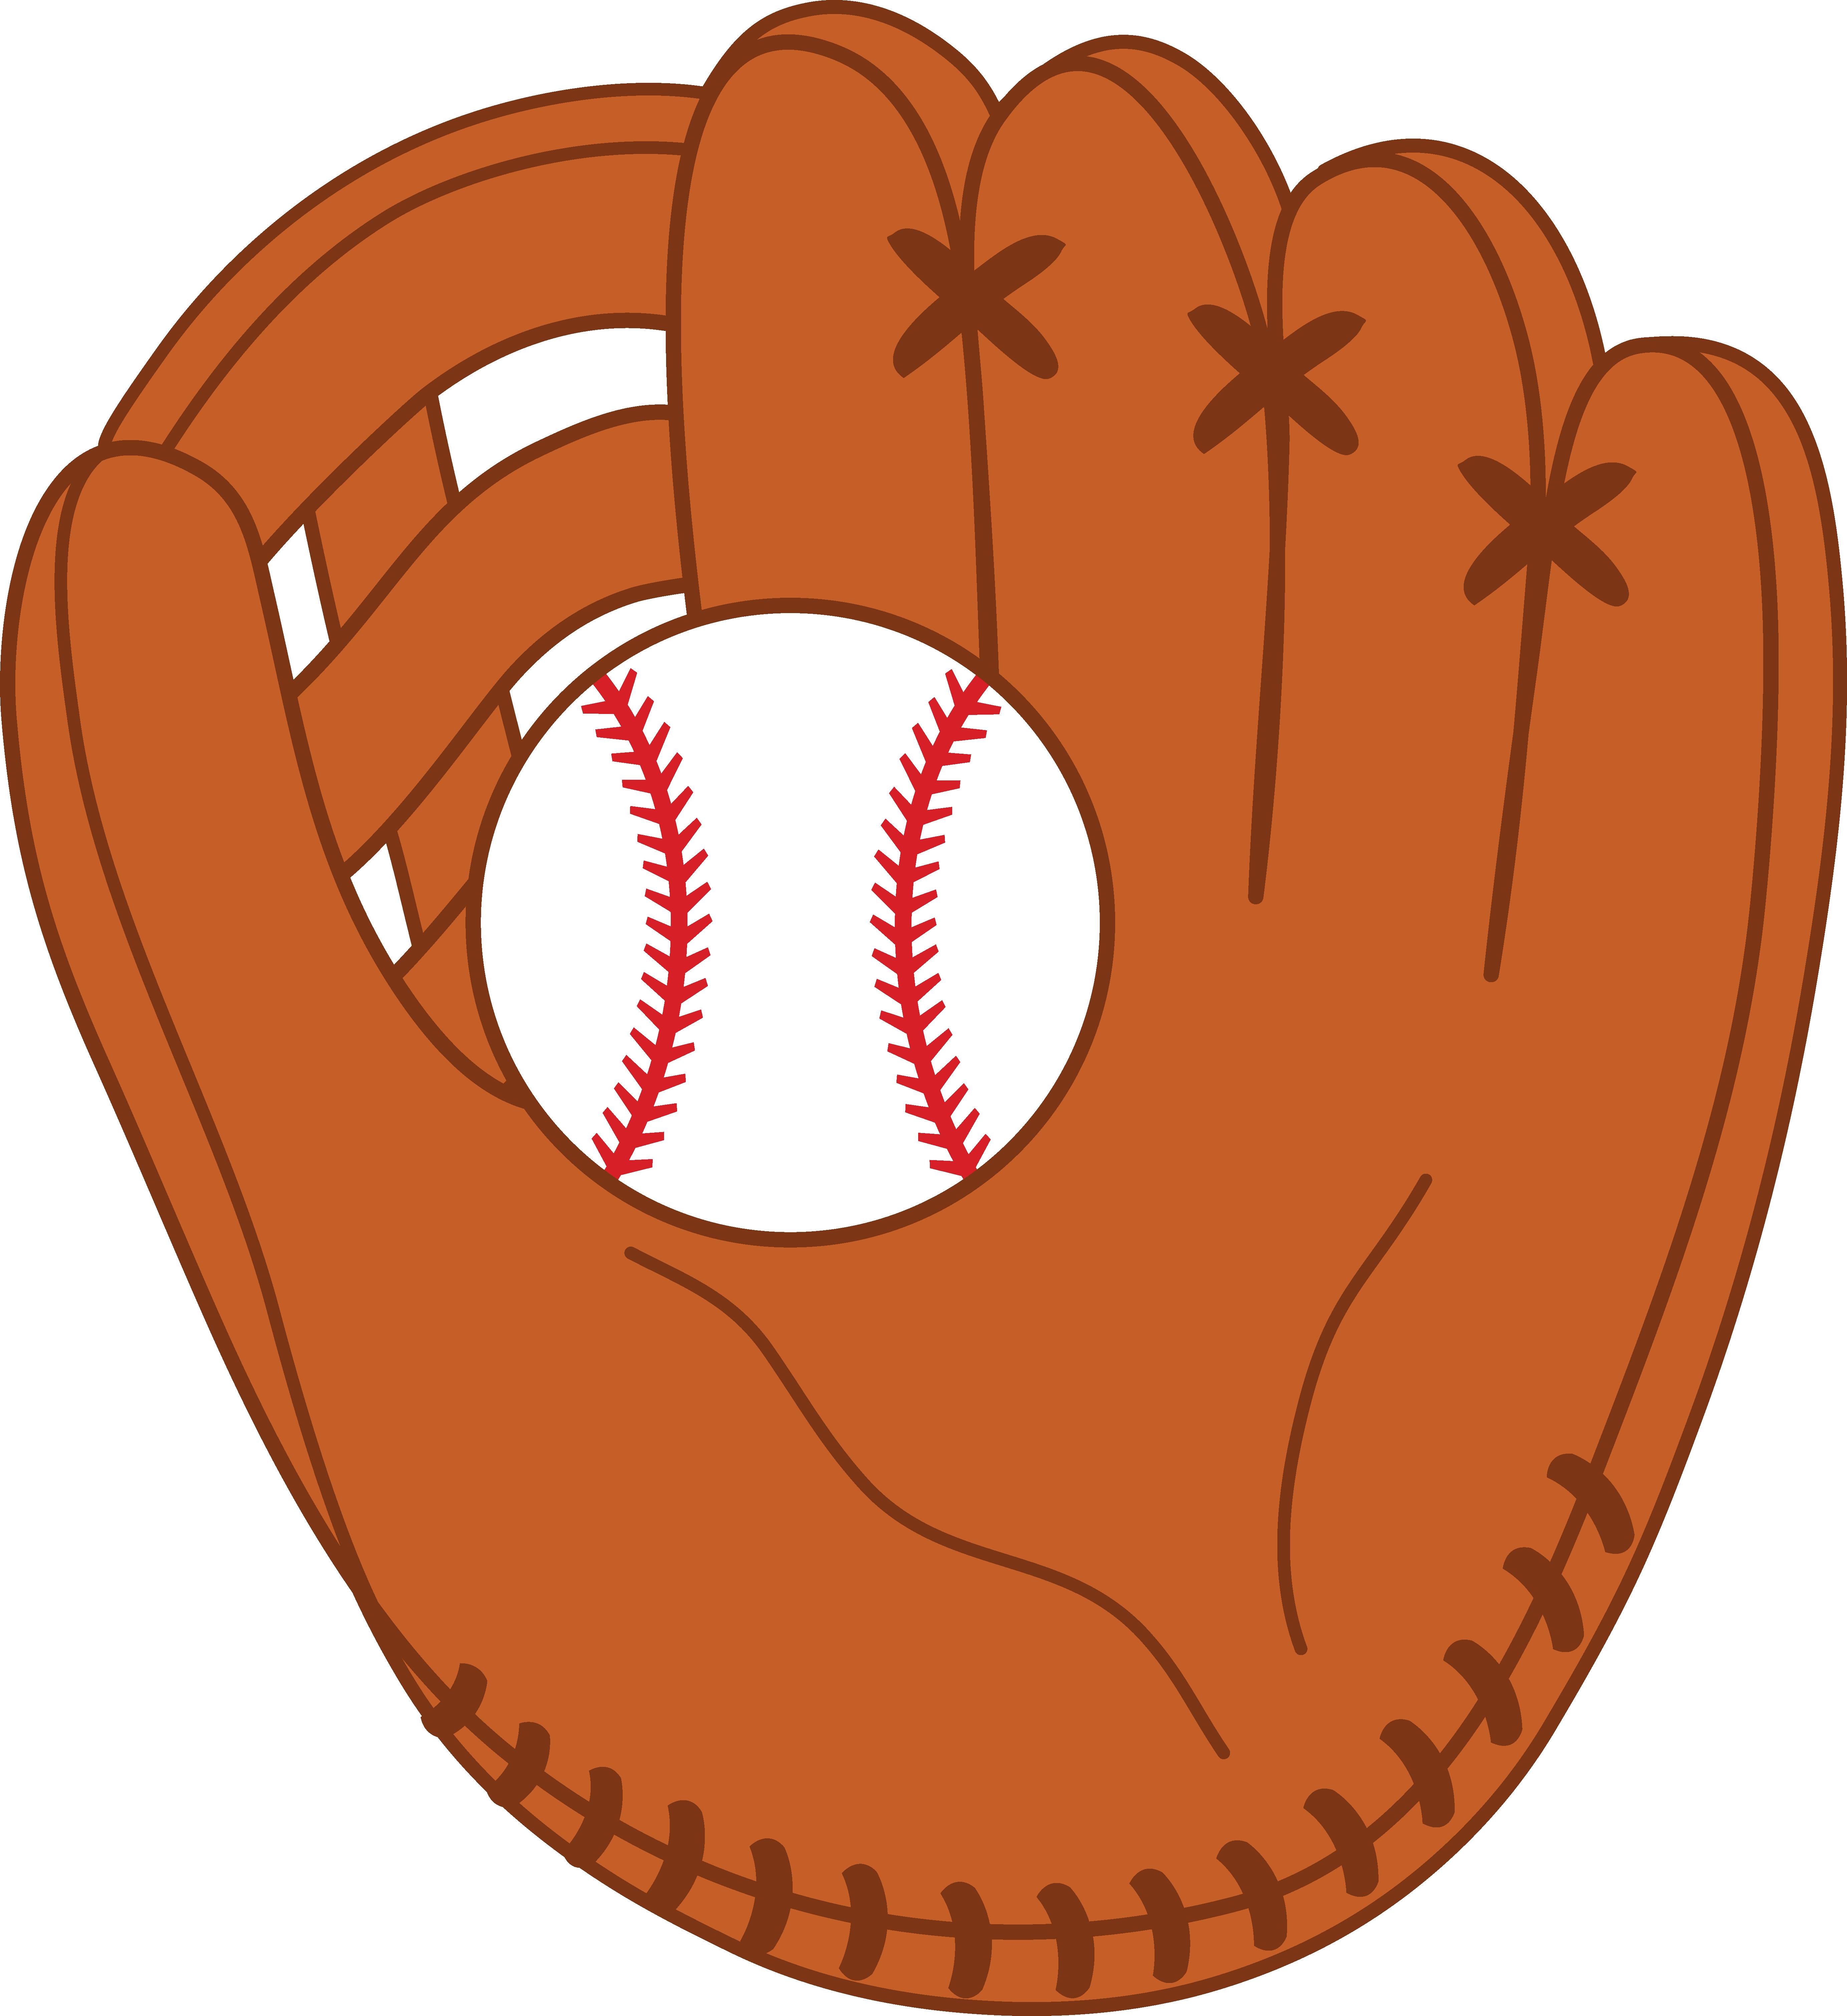 Free Baseball Cliparts, Download Free Clip Art, Free Clip.